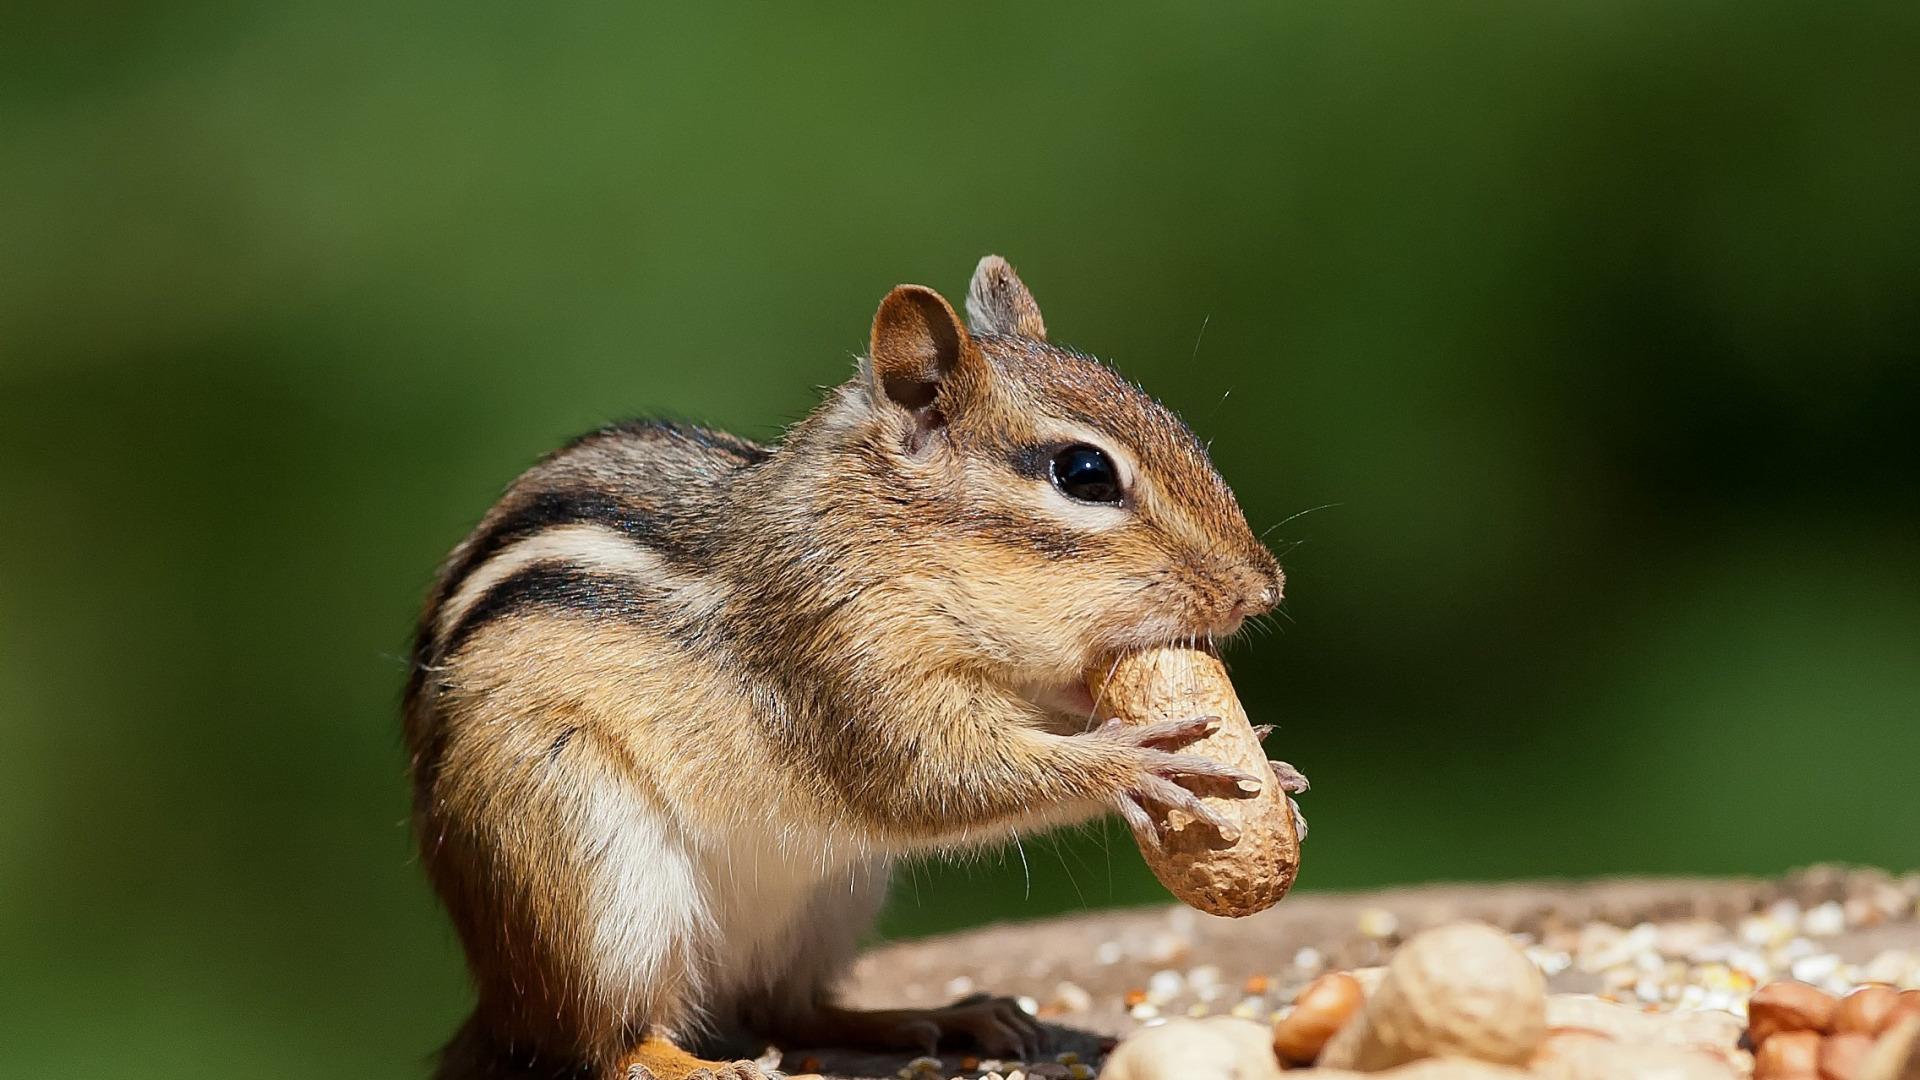 бурундук с арахисом  № 136391 загрузить